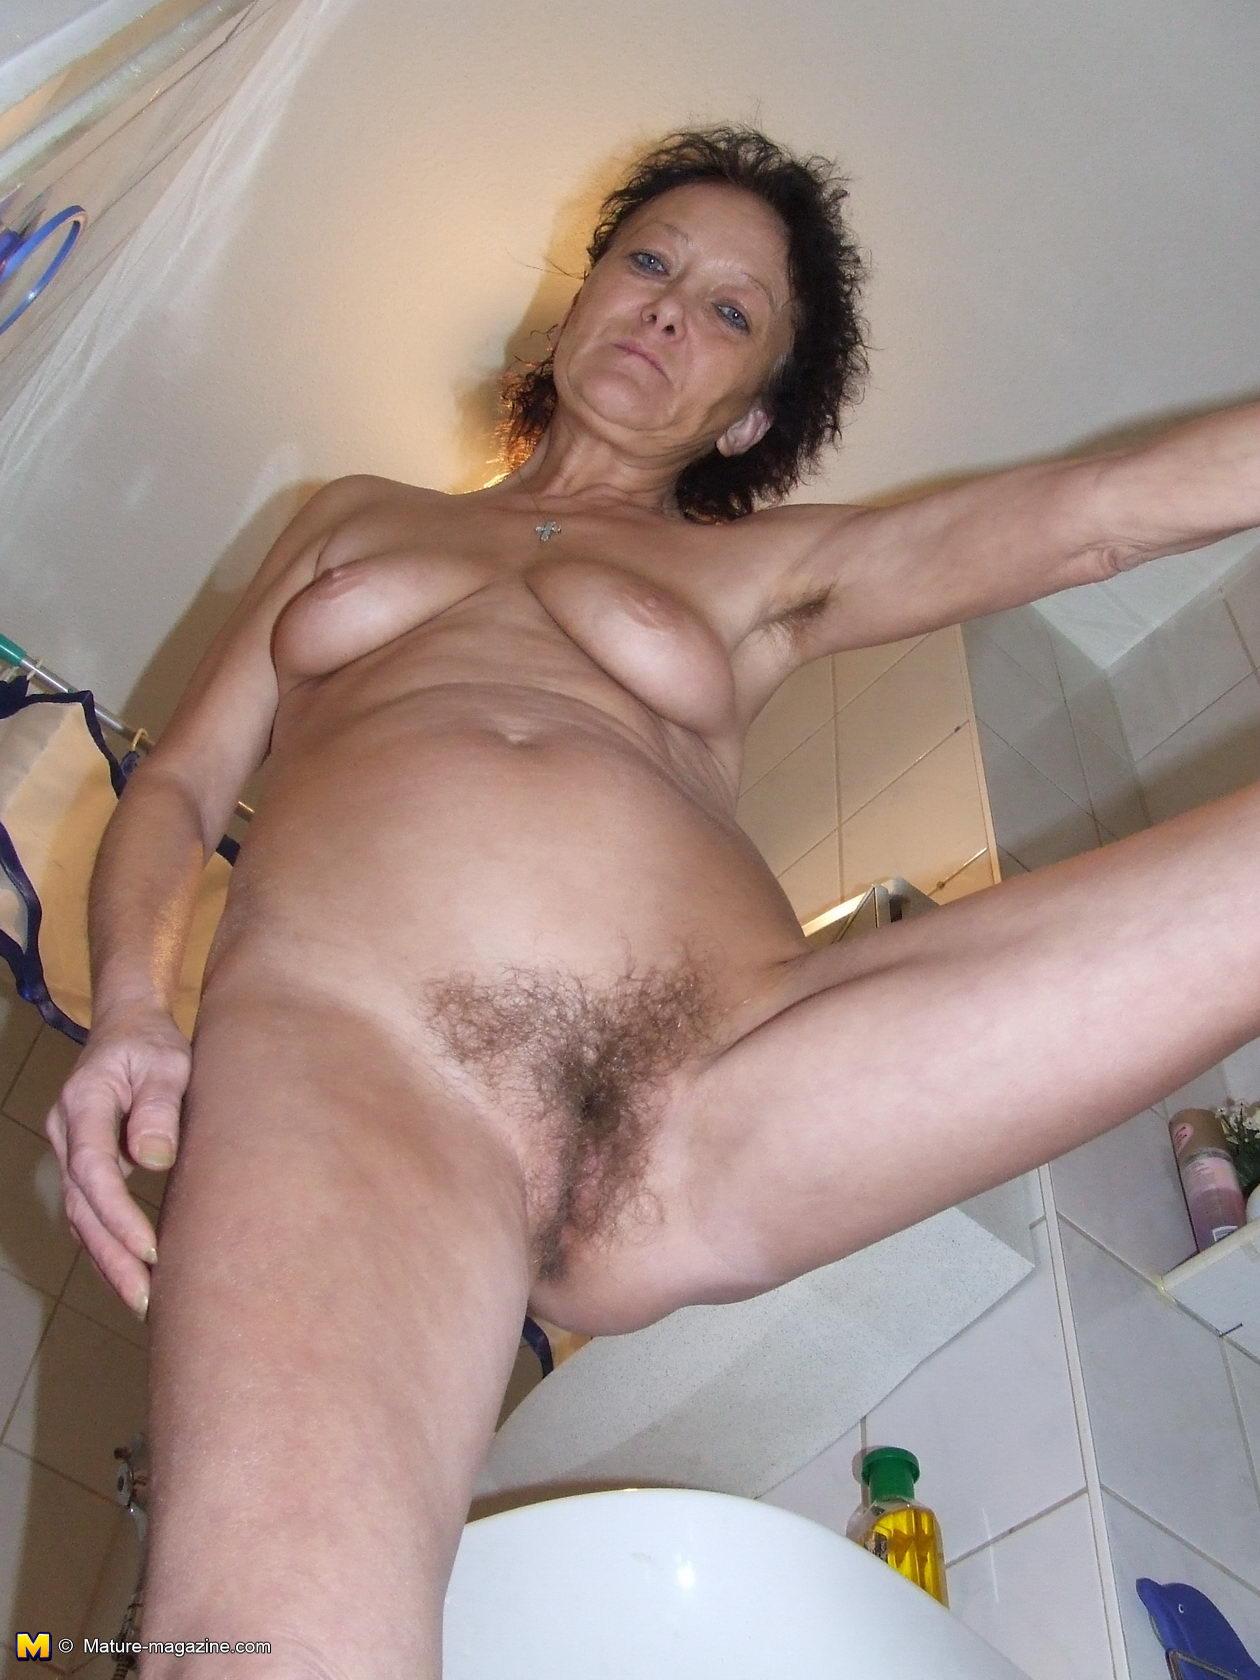 Tara reid botched boob pic